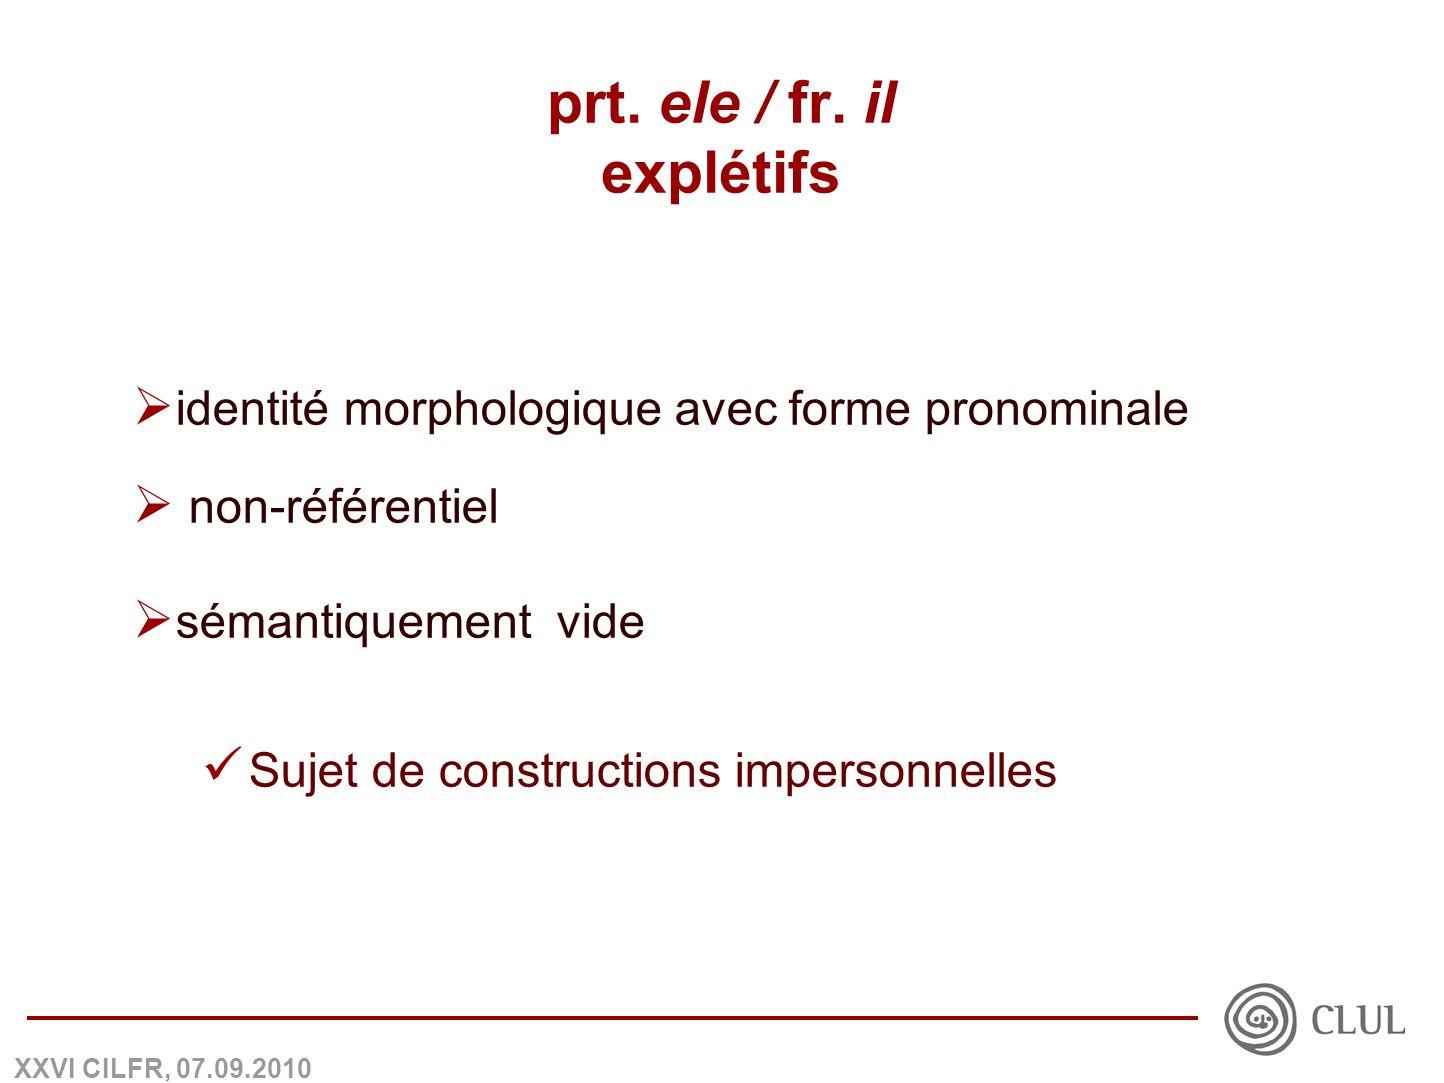 XXVI CILFR, 07.09.2010 prt. ele / fr.